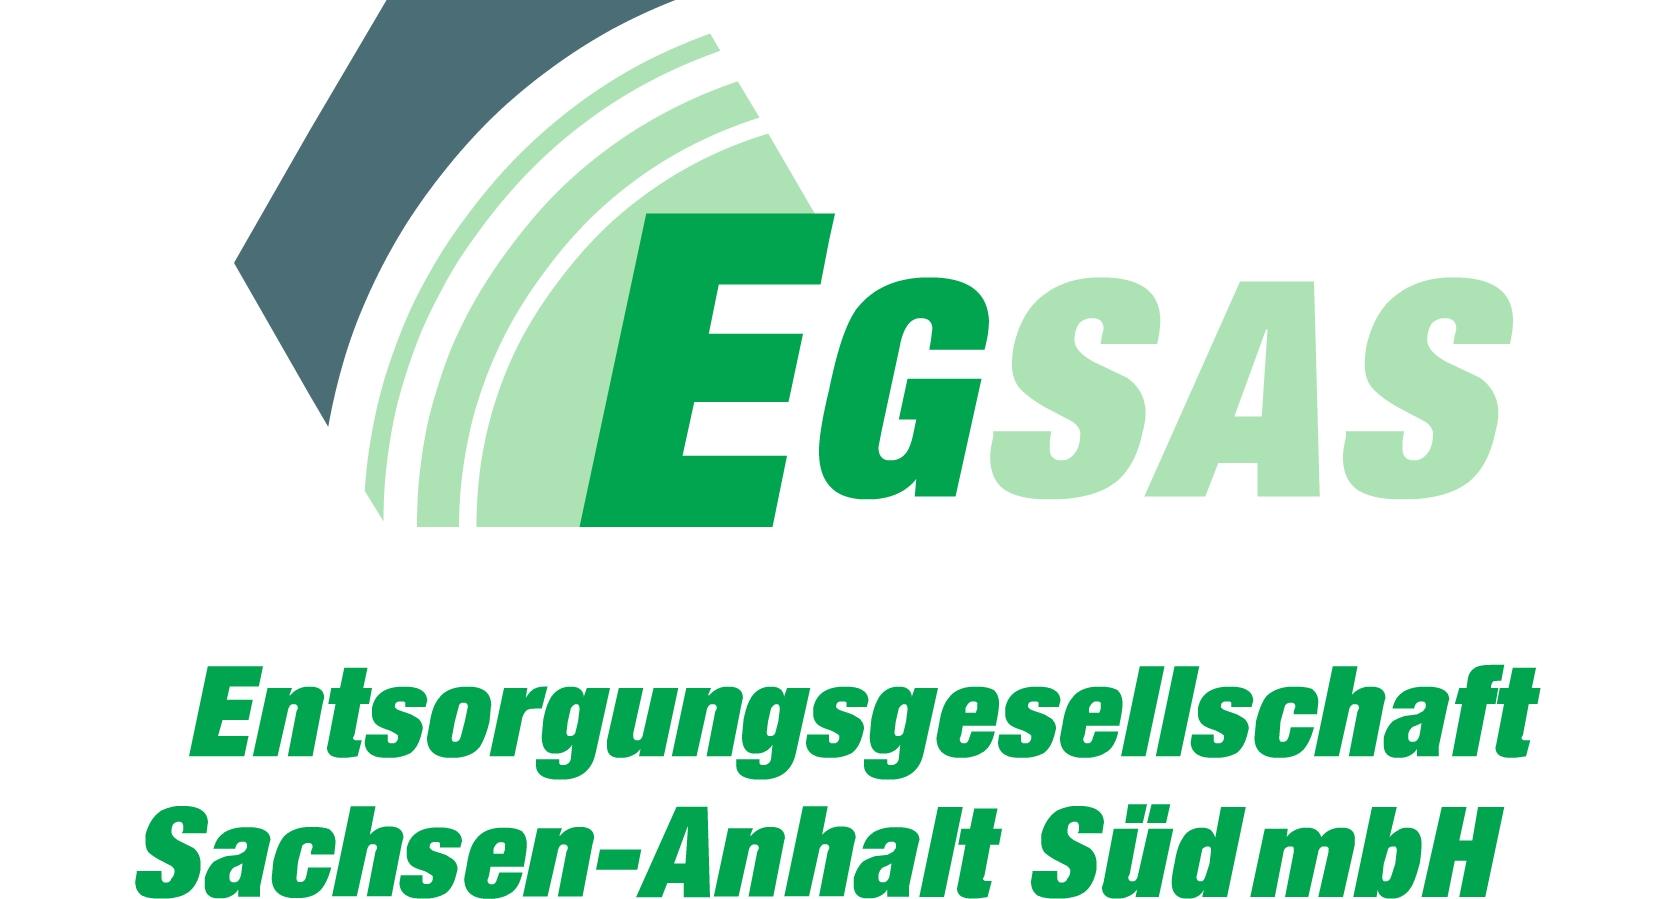 EGSAS Entsorg.-gesellschaft